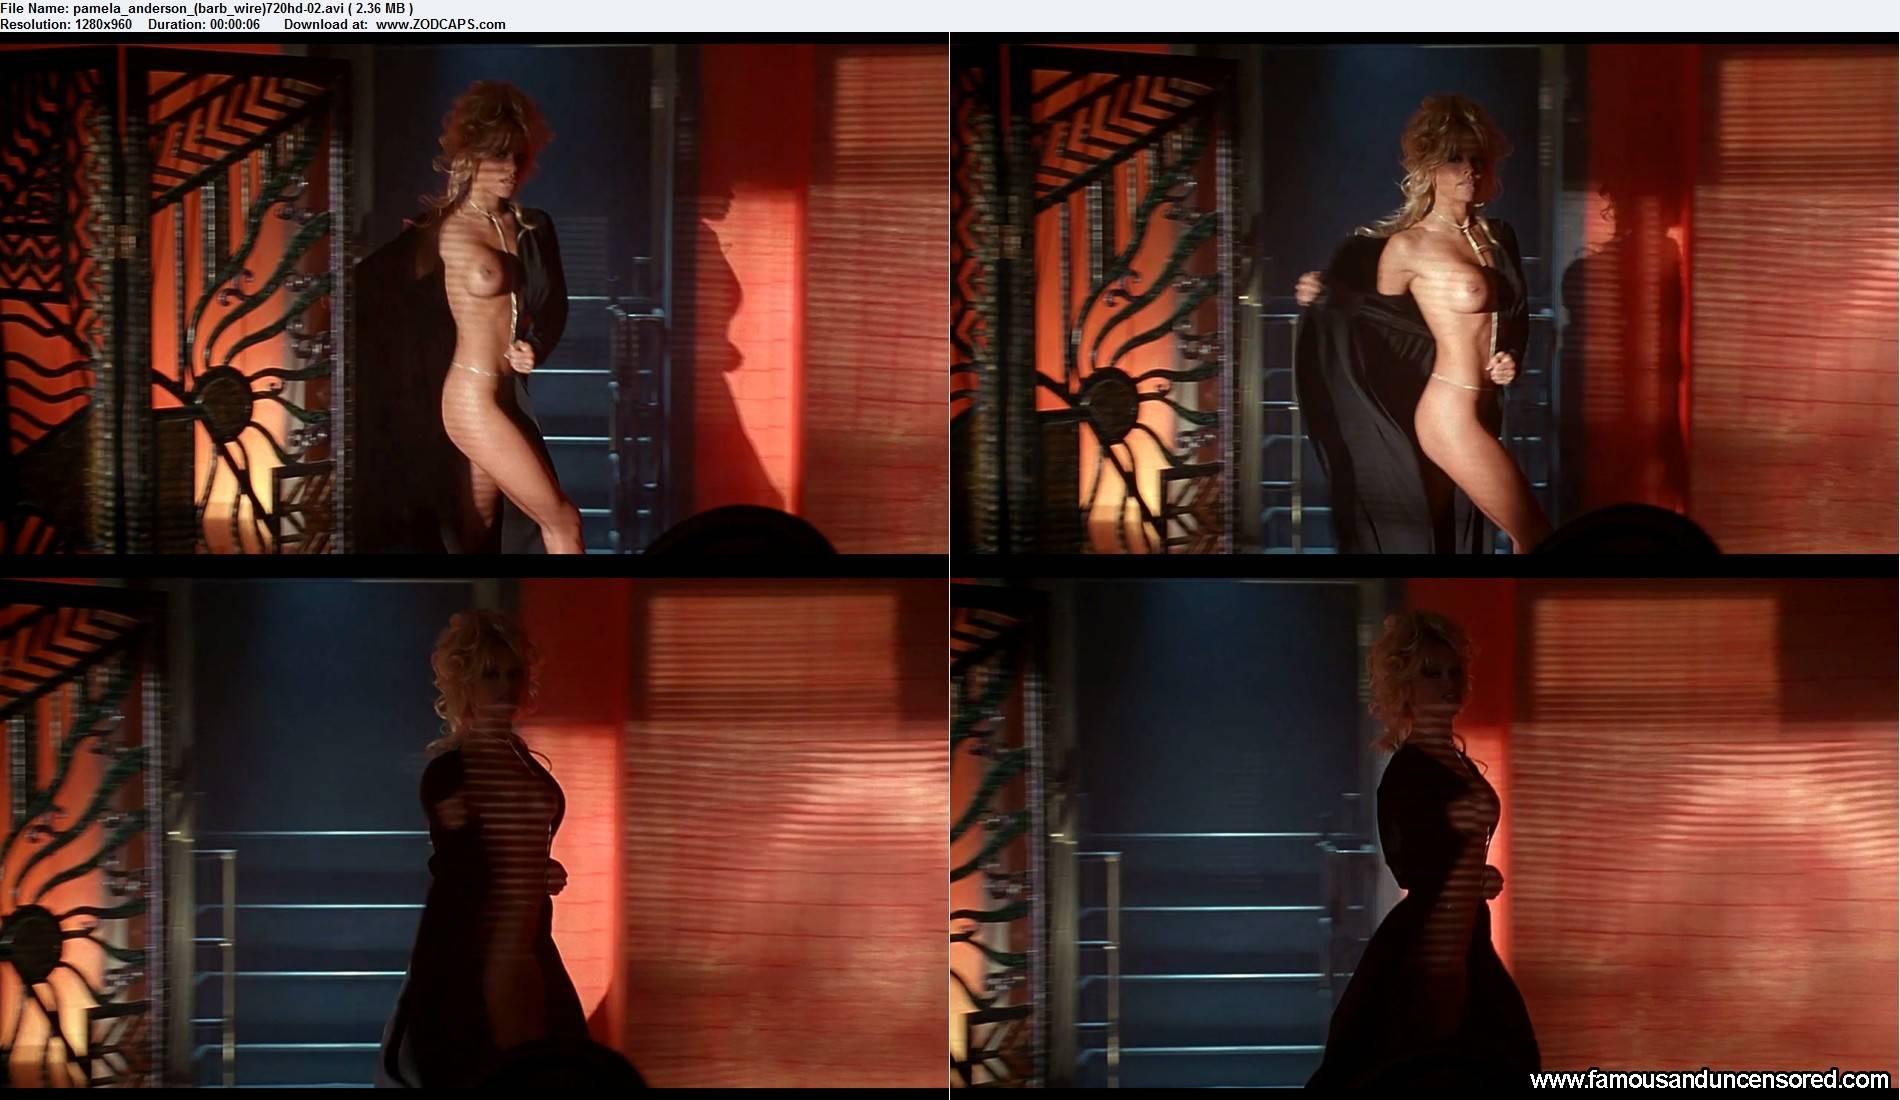 Nikki gil nude pic